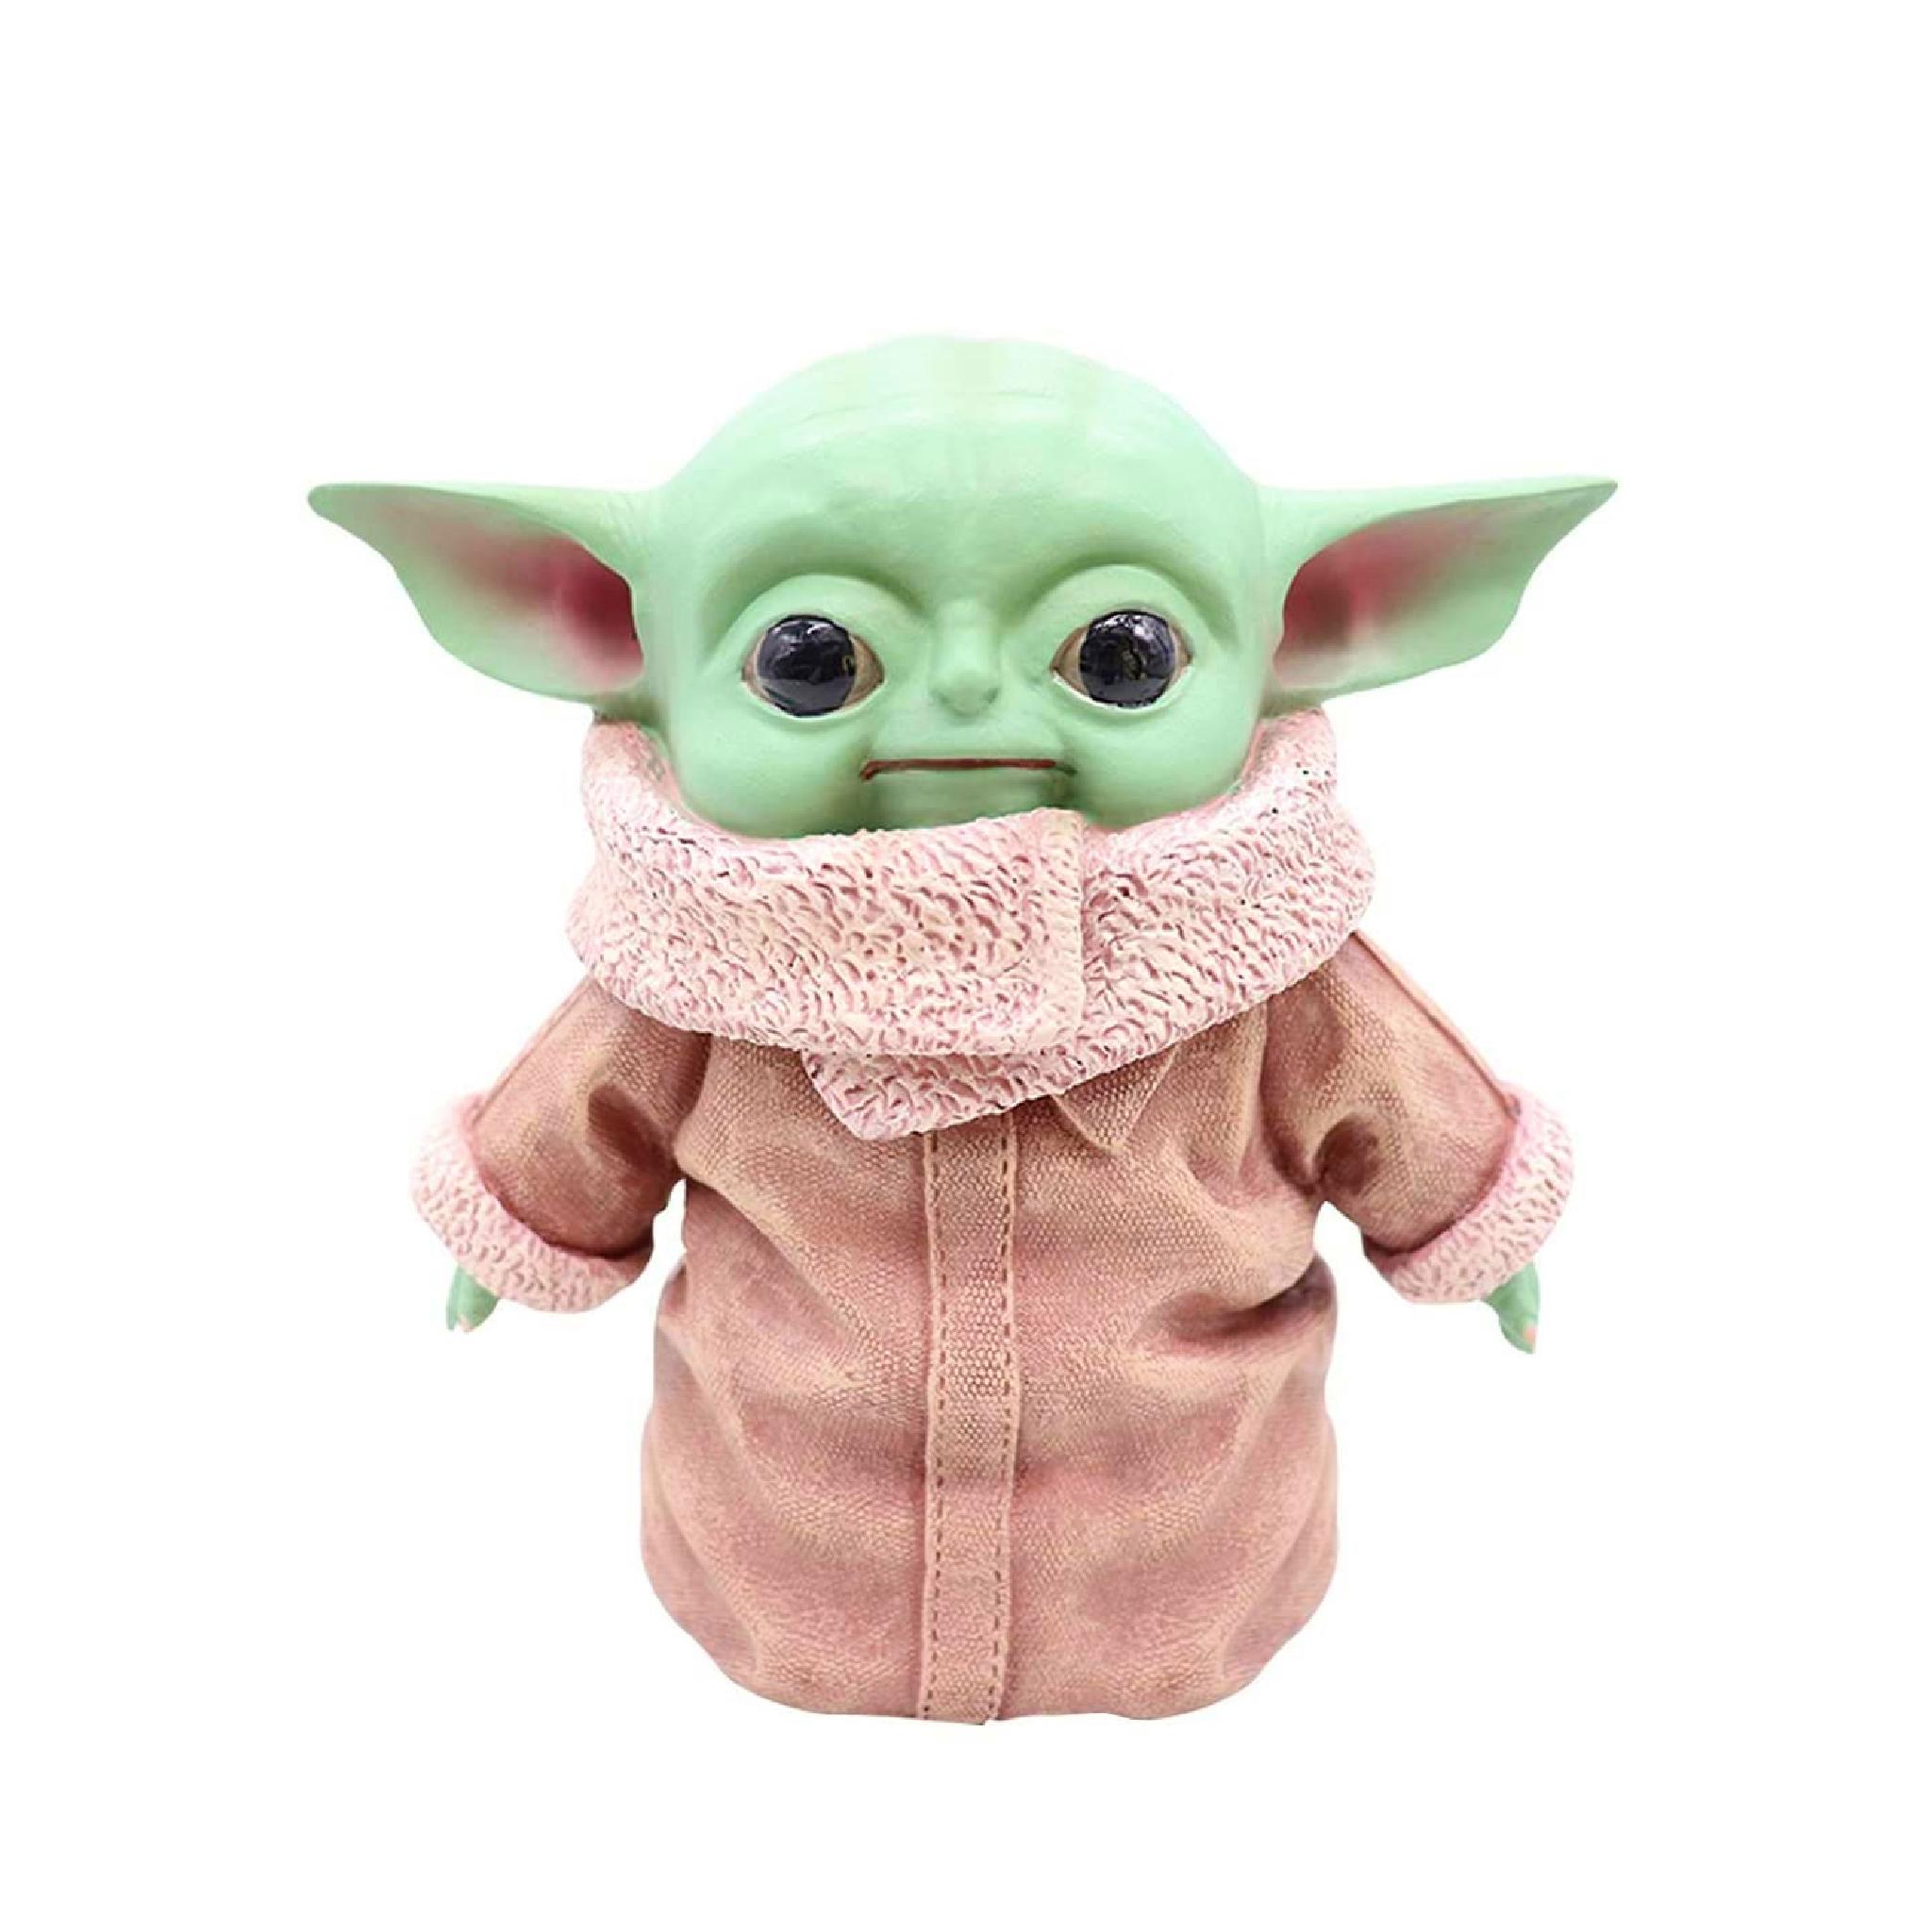 Star Wars Yoda Baby Decoration - a Star Wars gadget